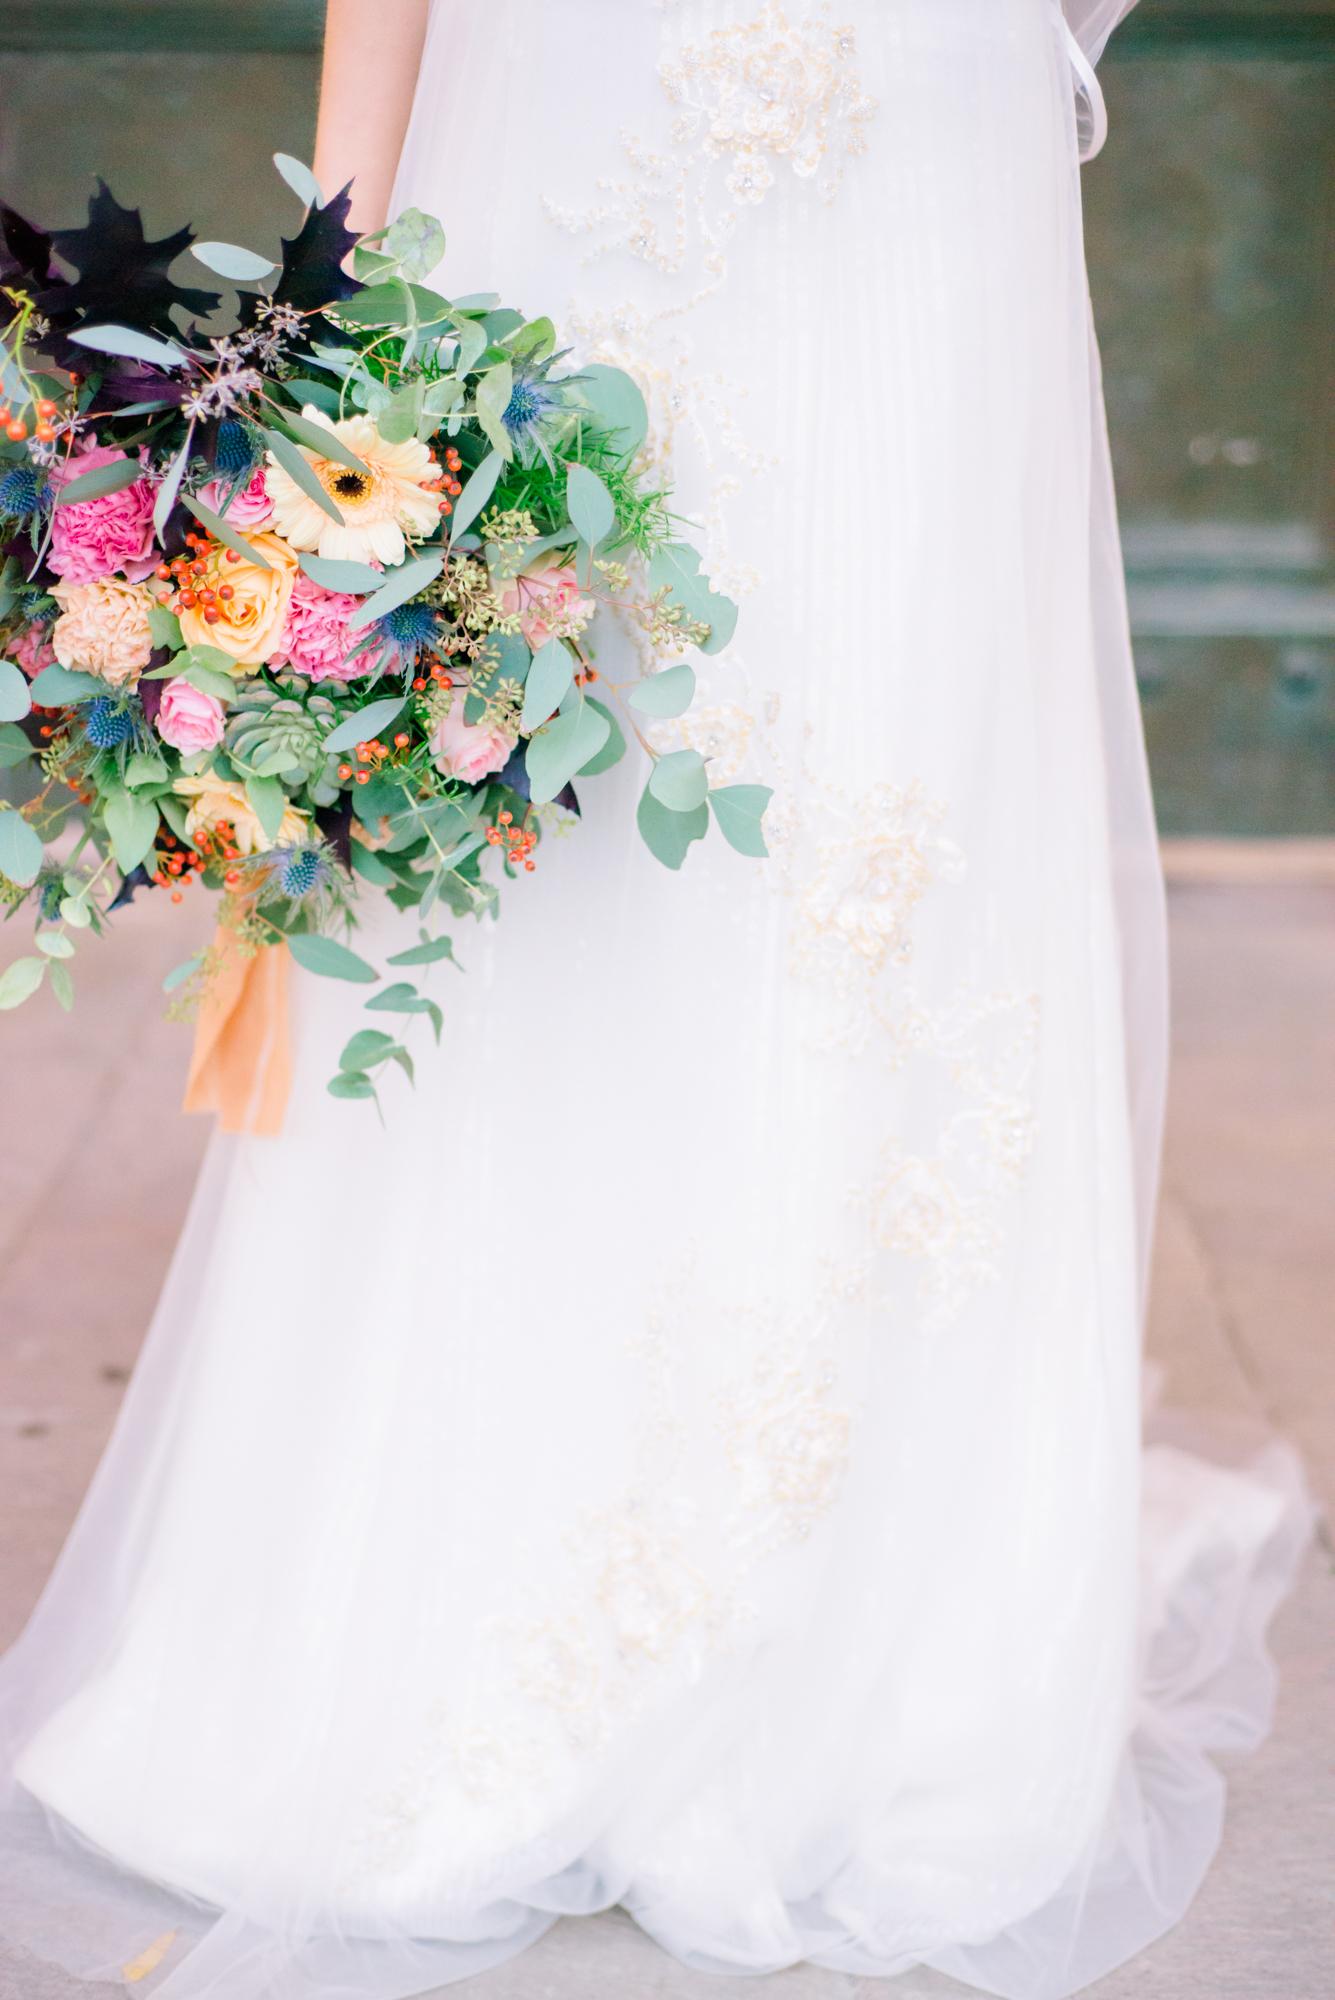 Elegant Organic Fall Swedish Bridal Wedding Styled Shoot - Erika Alvarenga Photography-76.jpg